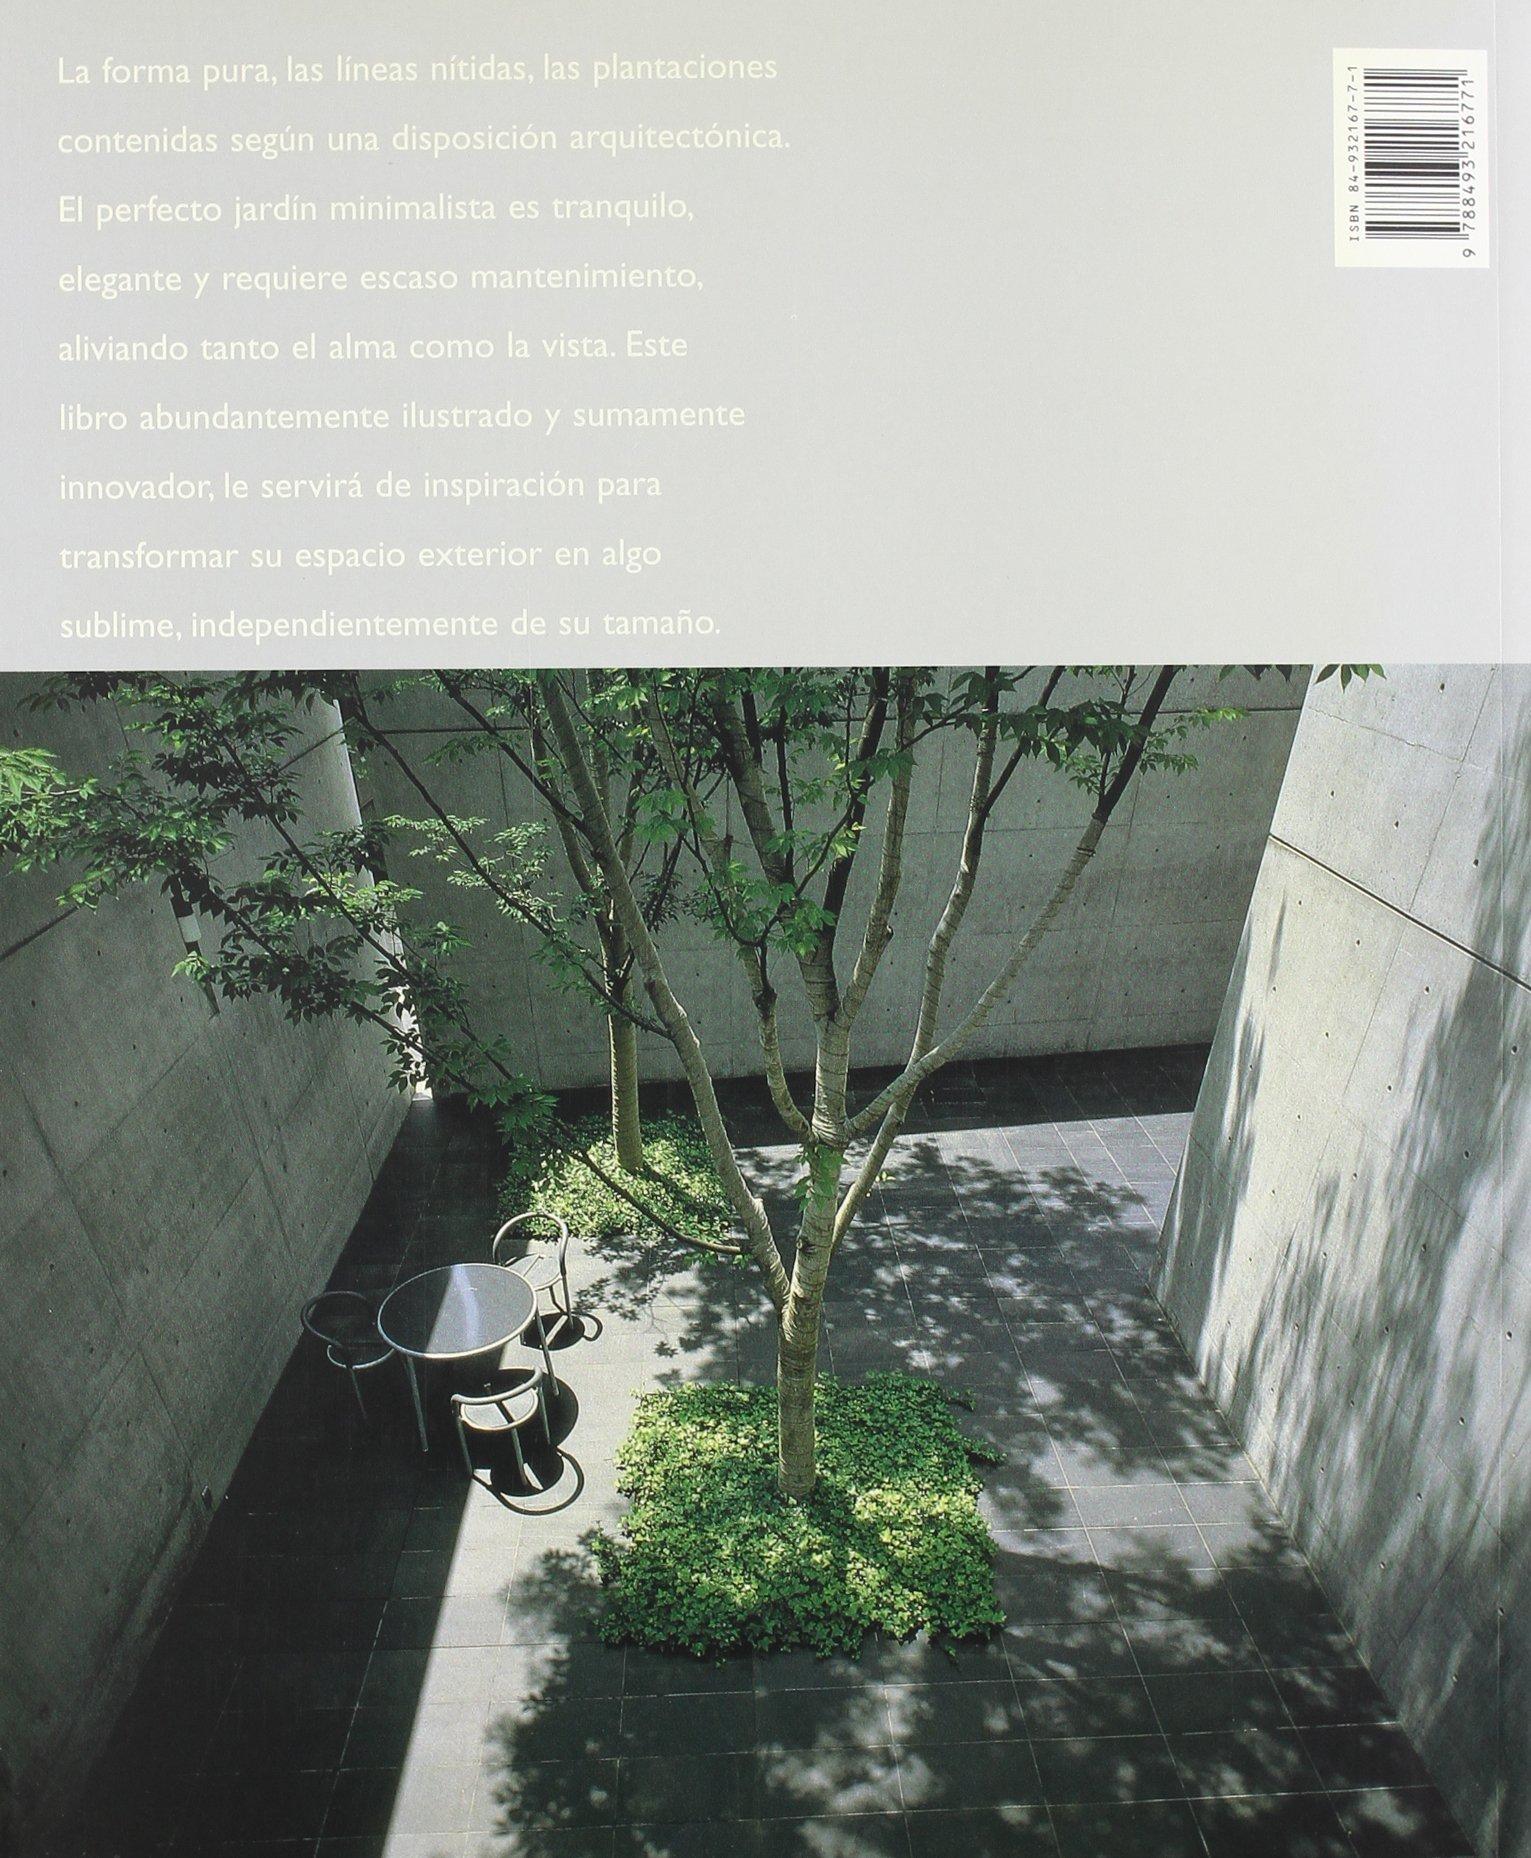 El Jardin Minimalista Spanish Edition 9788493216771 Amazoncom - Jardin-minimalista